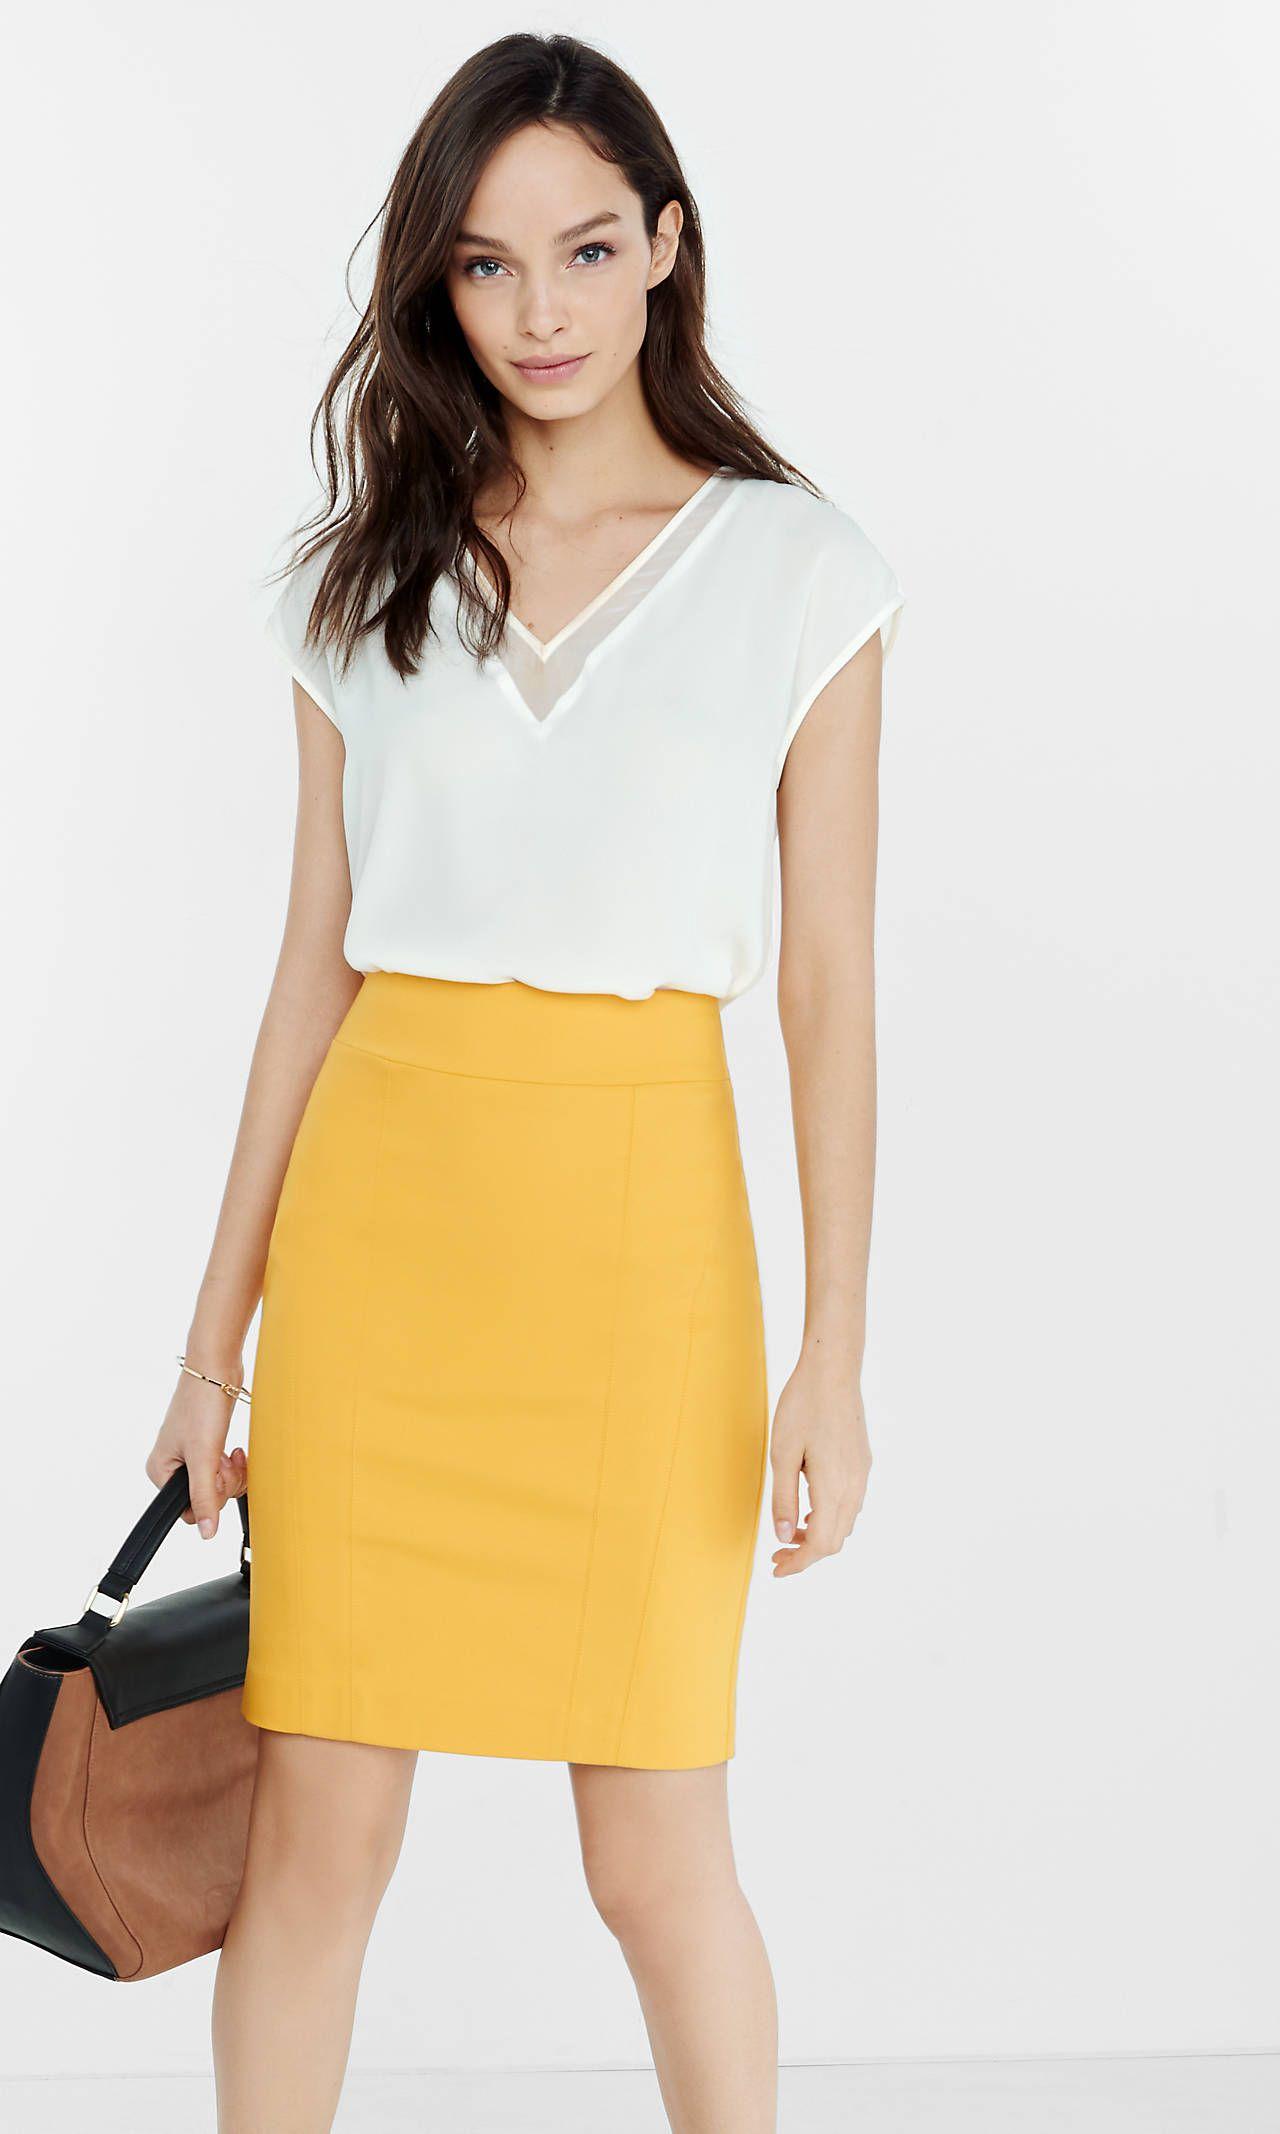 Waisted high skirts outfits ideas